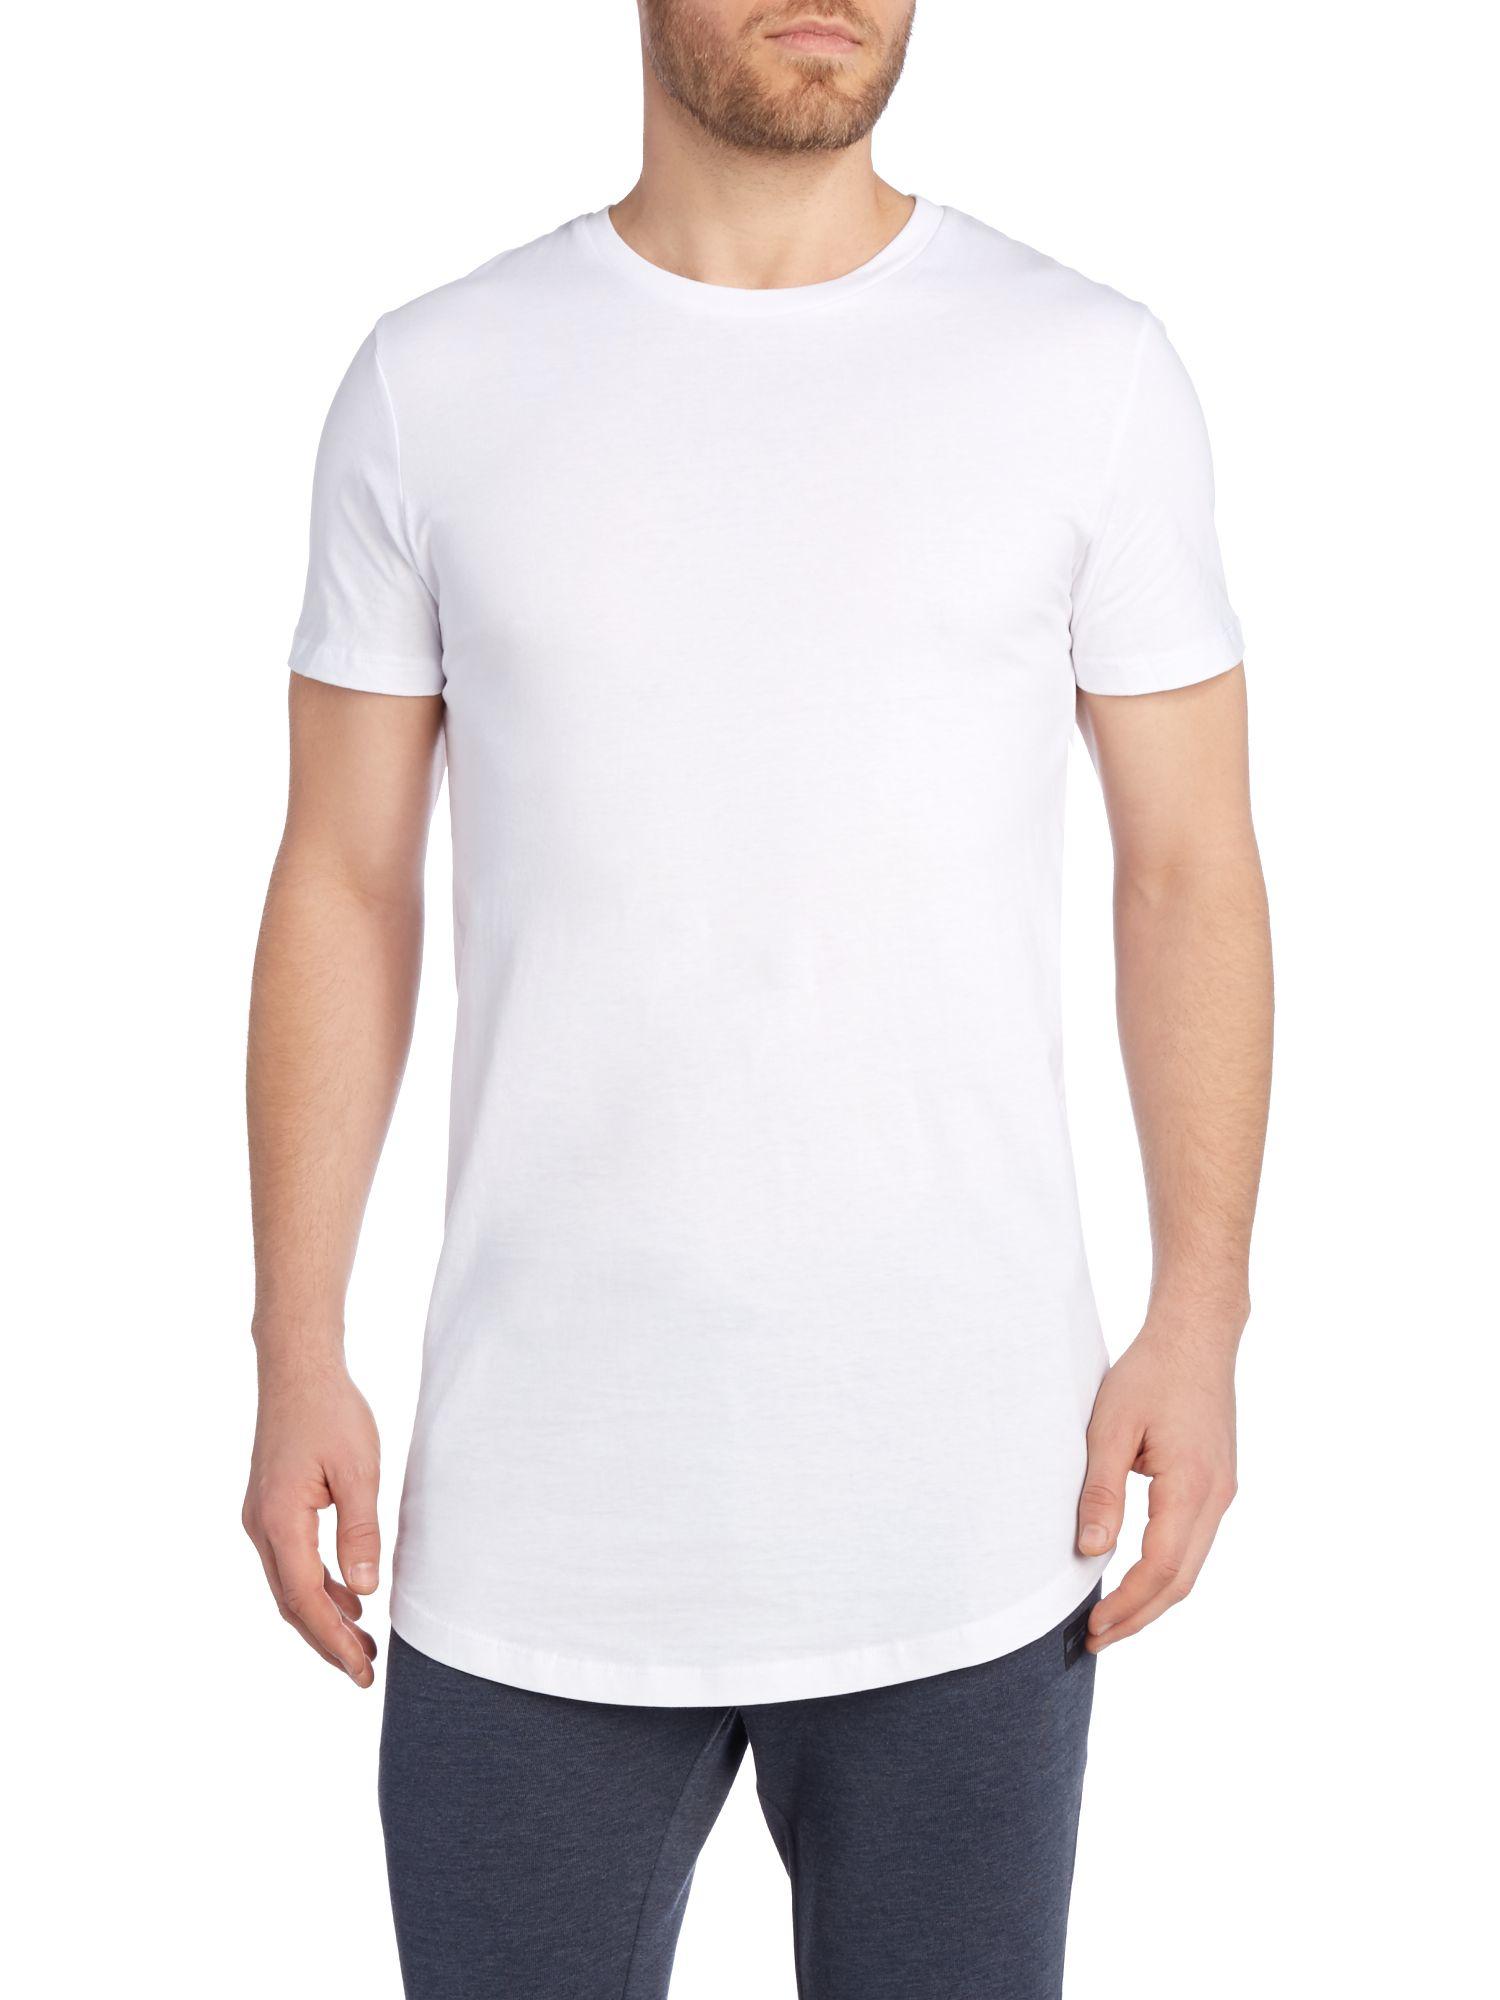 Jack jones long line plain short sleeve t shirt in white for Long line short sleeve t shirt